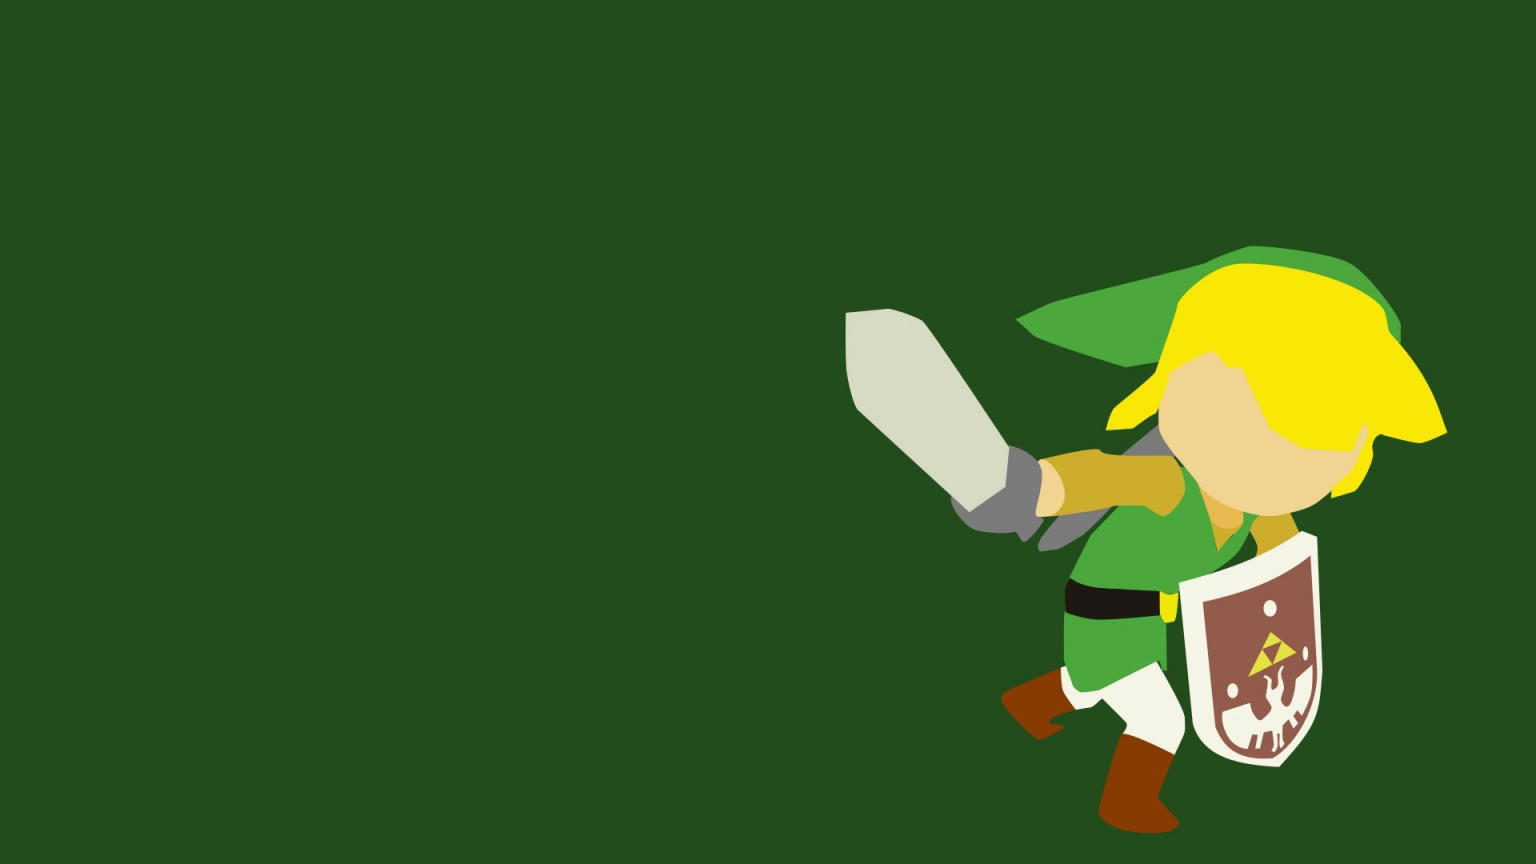 Free Download Link The Legend Of Zelda Minimalism Video Games